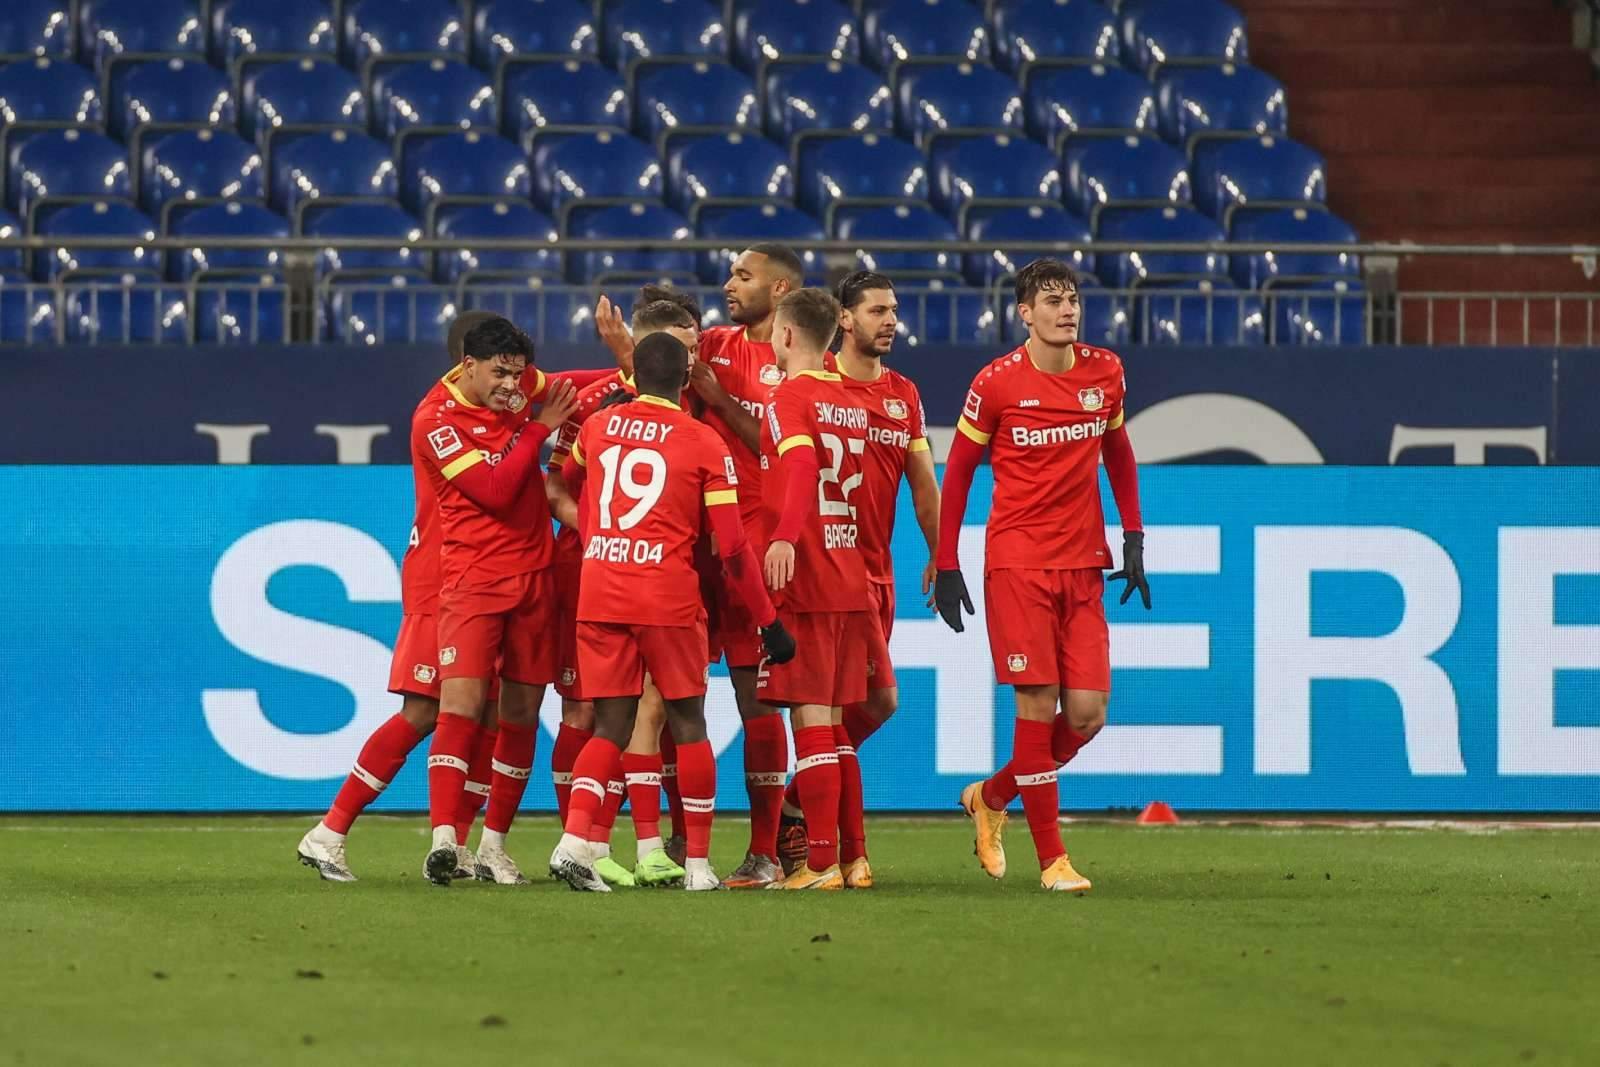 «Аугсбург» - «Байер»: прогноз и ставка на матч немецкой Бундеслиги – 28 августа 2021